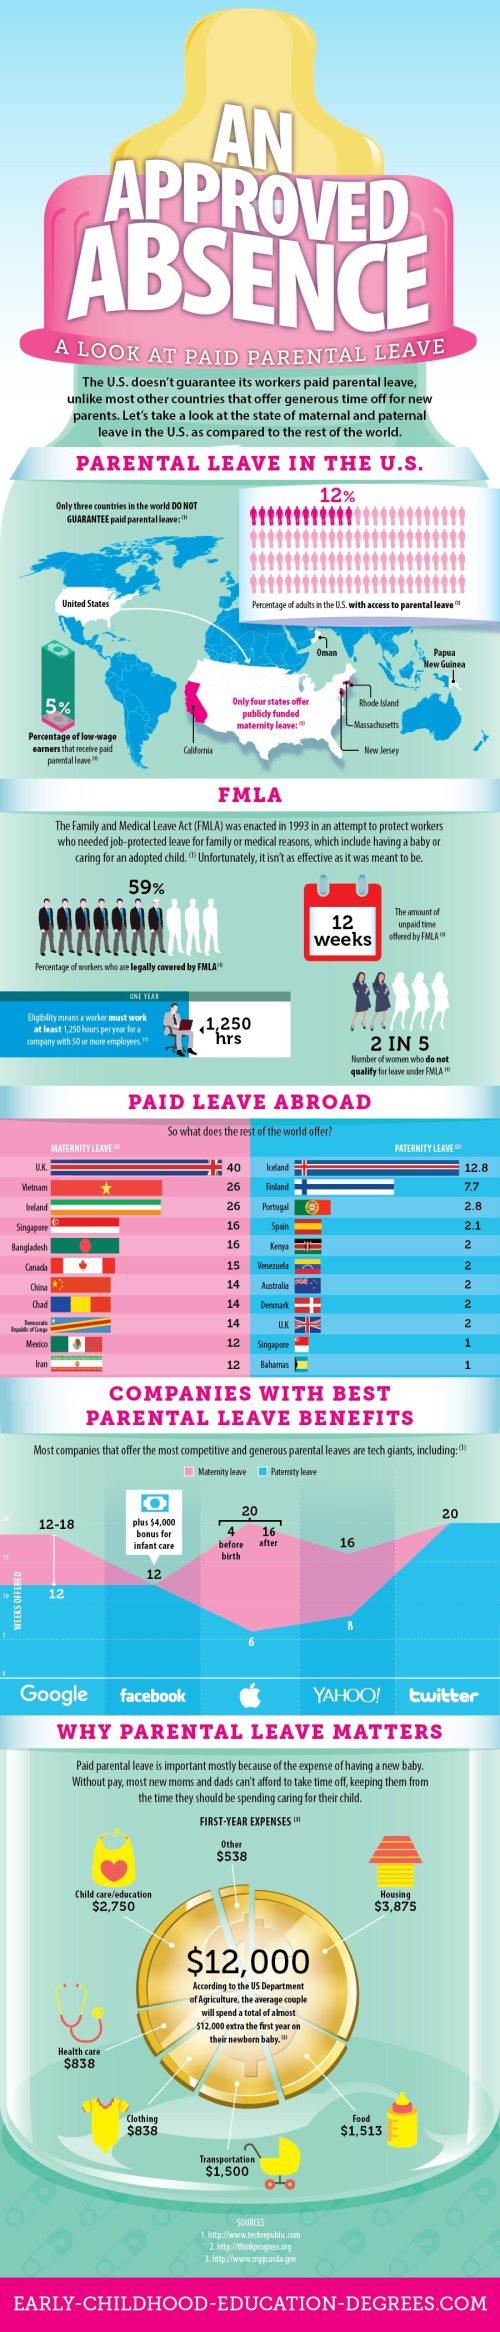 Paid Parental Leave